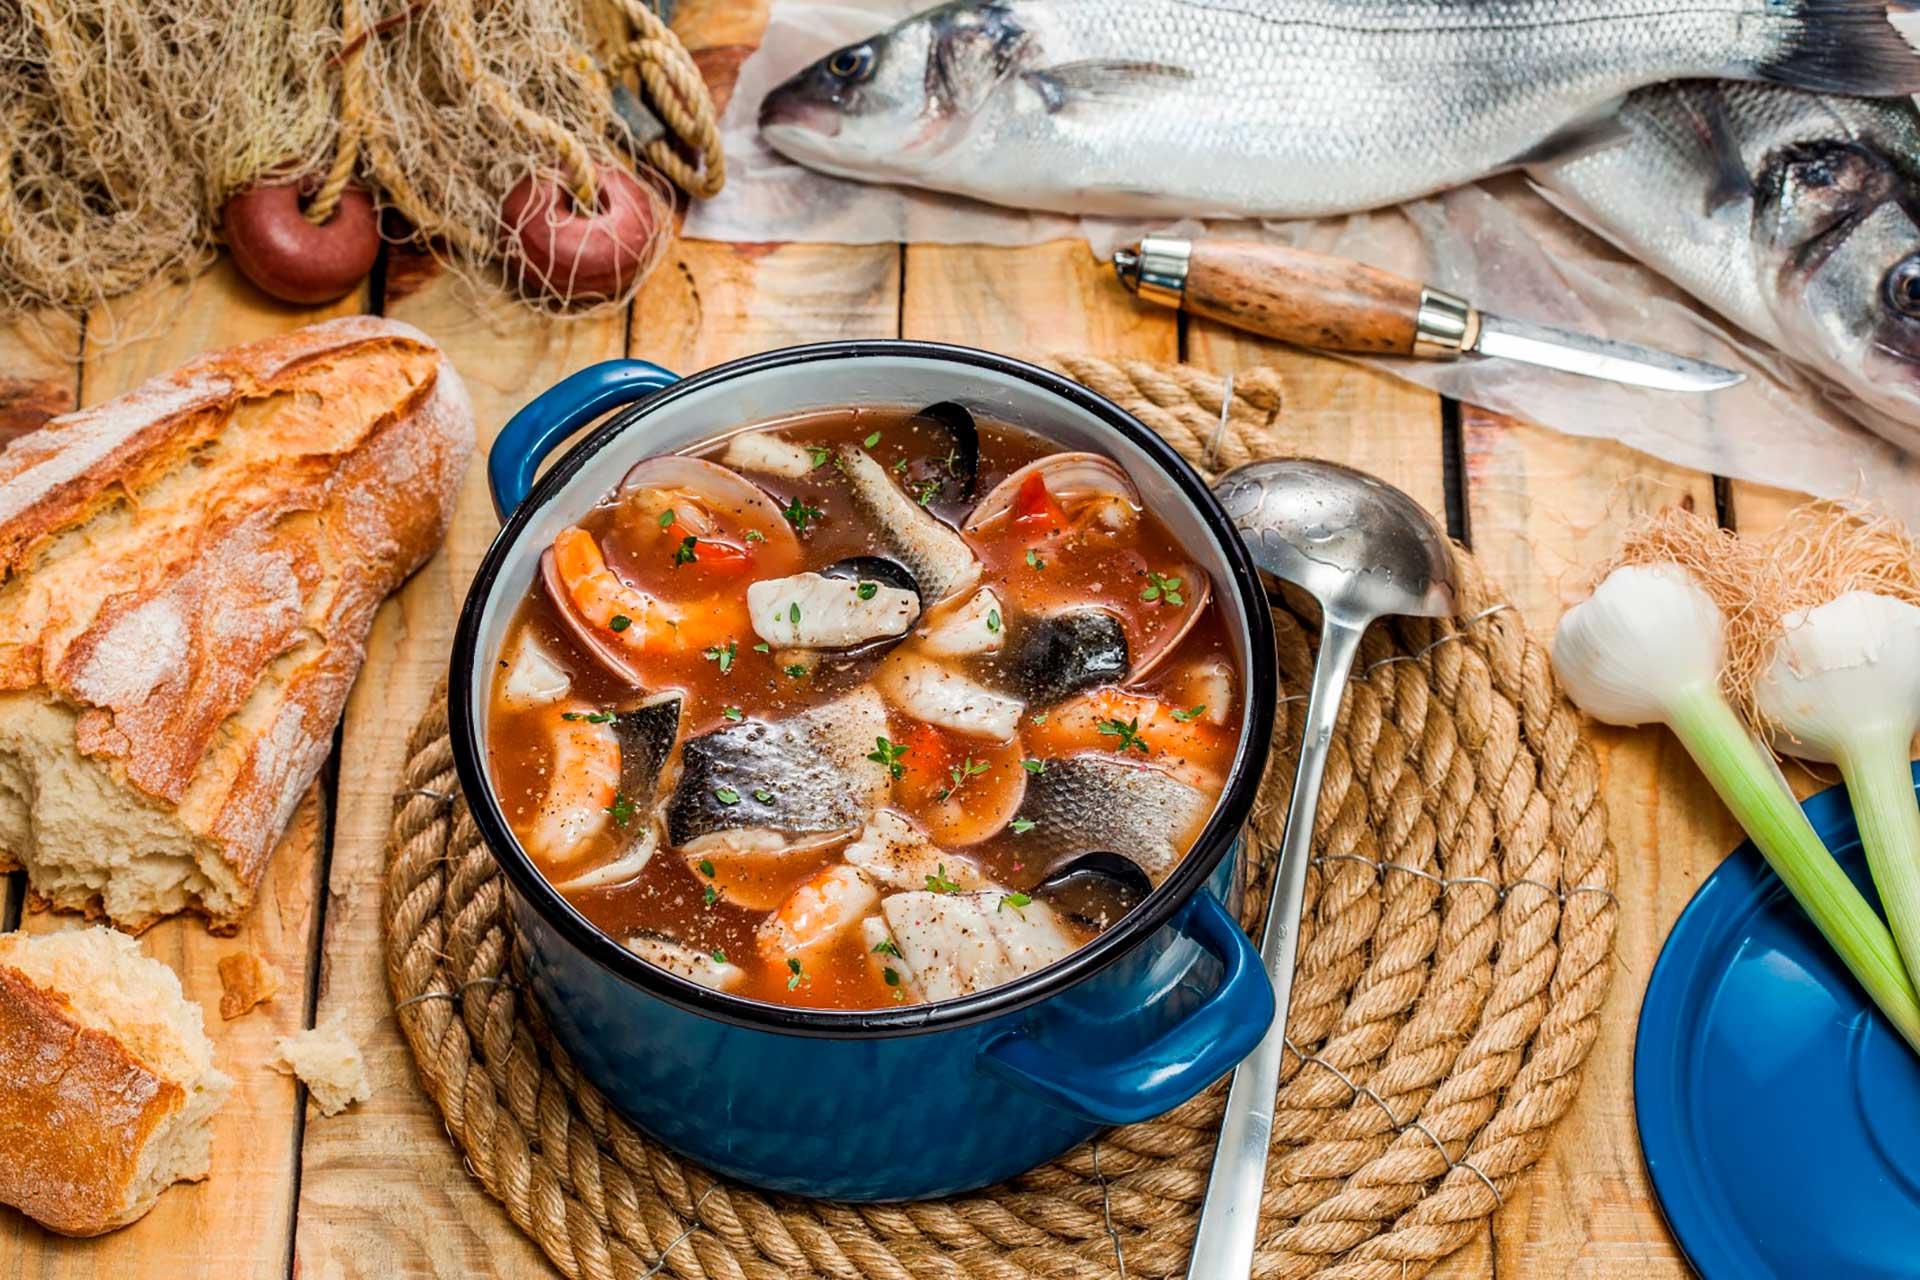 Mediterranean Diet & Healthy Seafood Fats | Kefalonia Fisheries